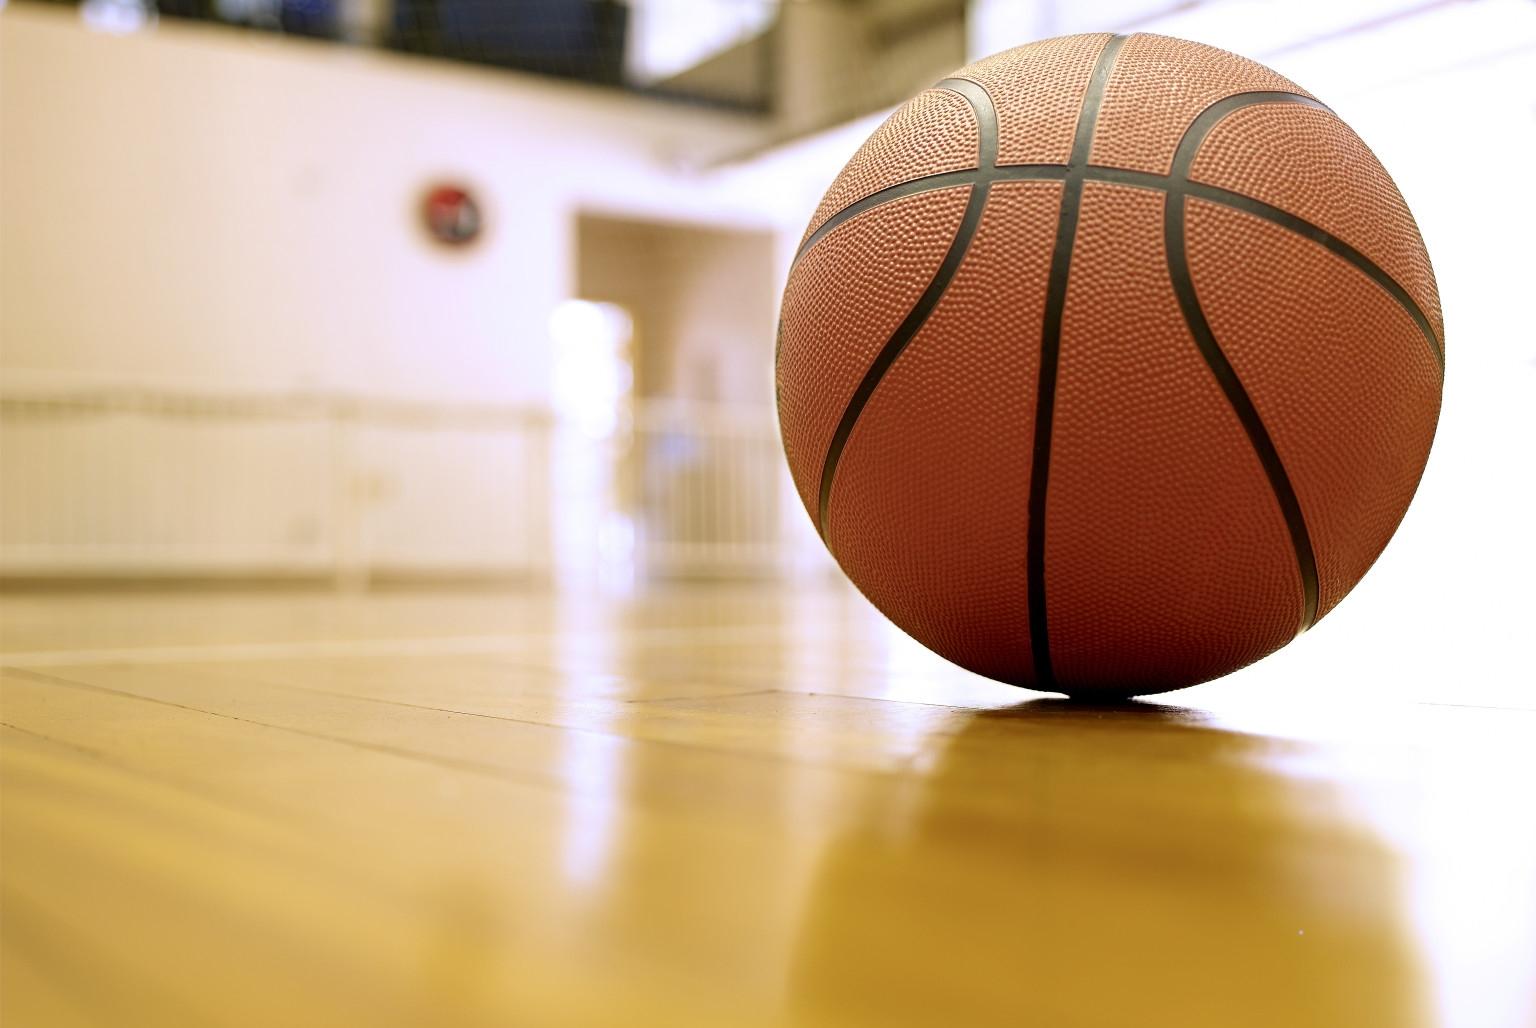 basketball-390008_1280.jpg